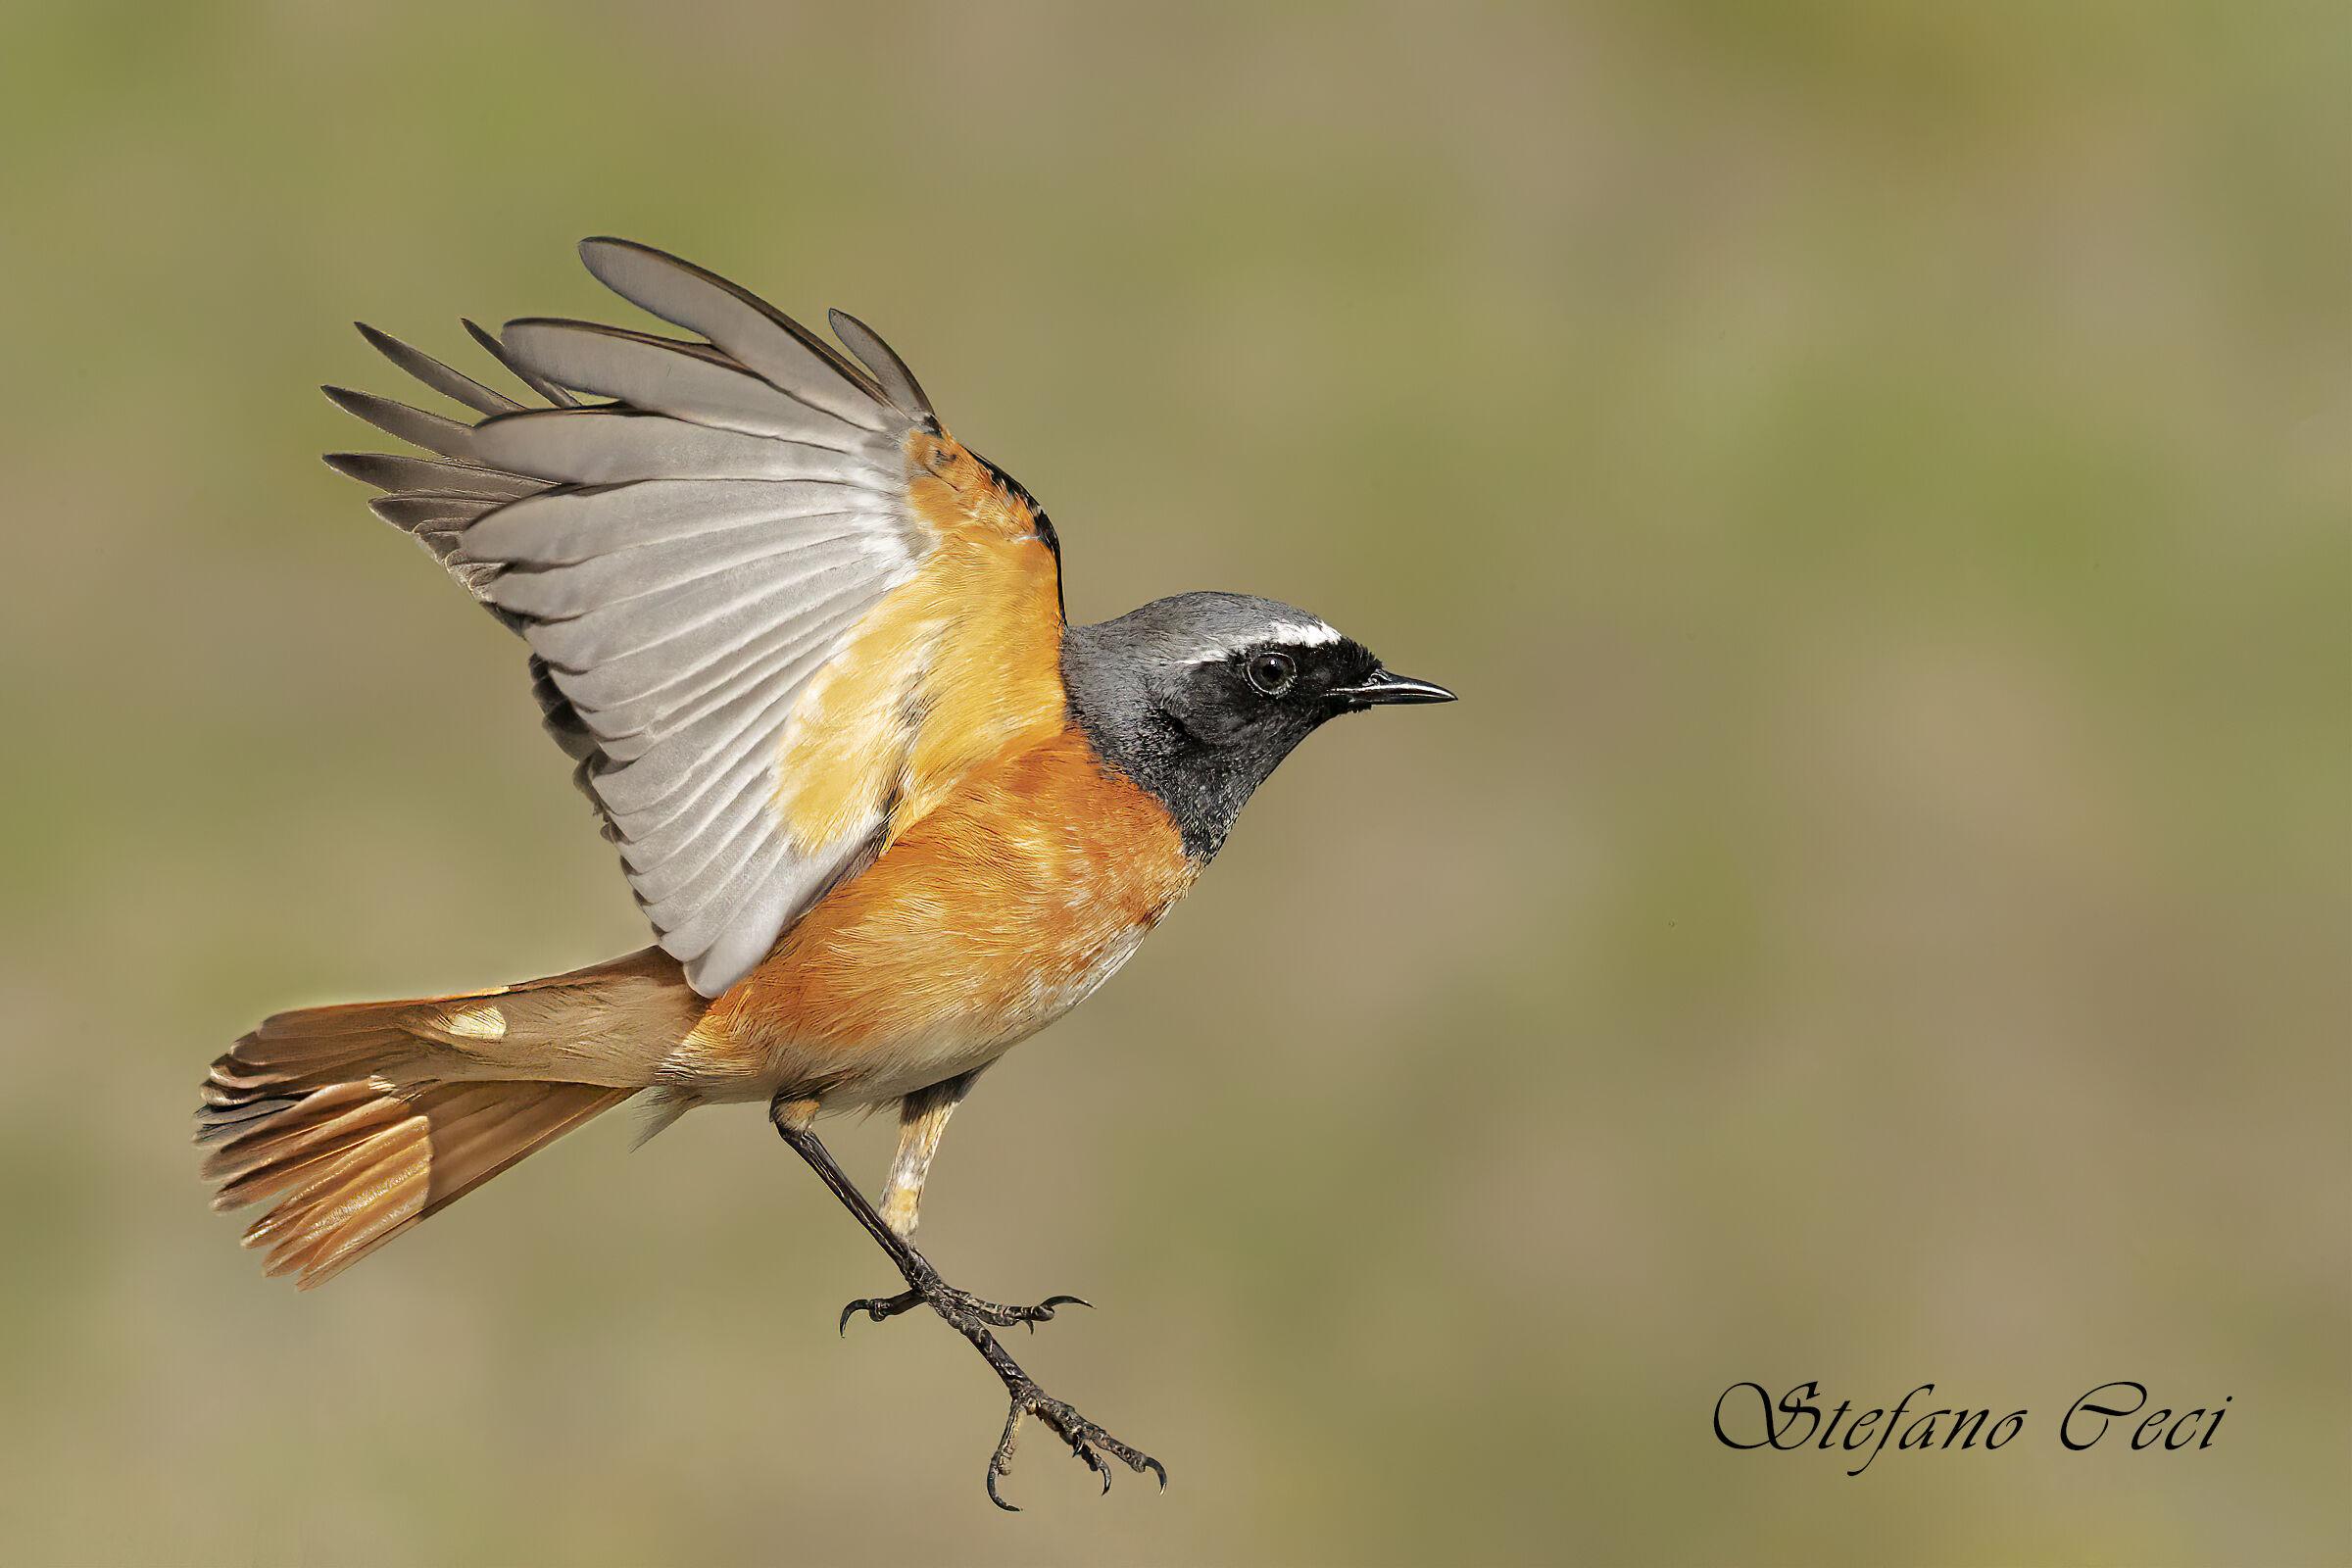 Codirosso in flight...